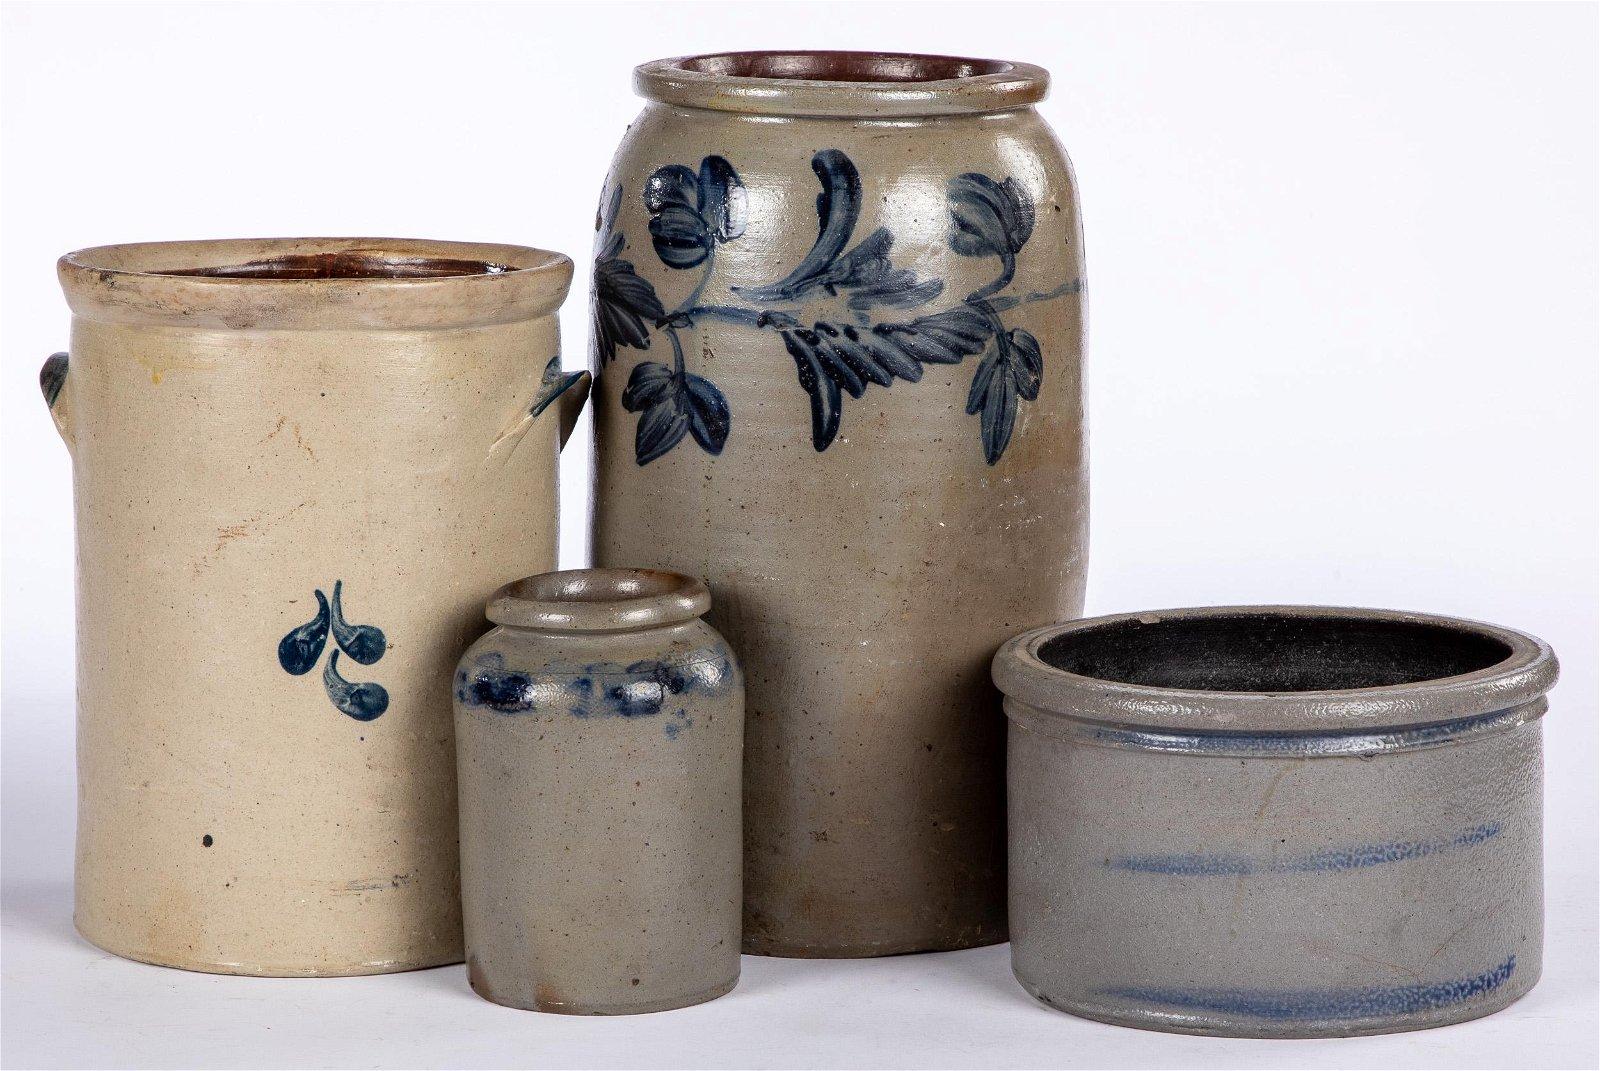 Four cobalt decorated stoneware crocks